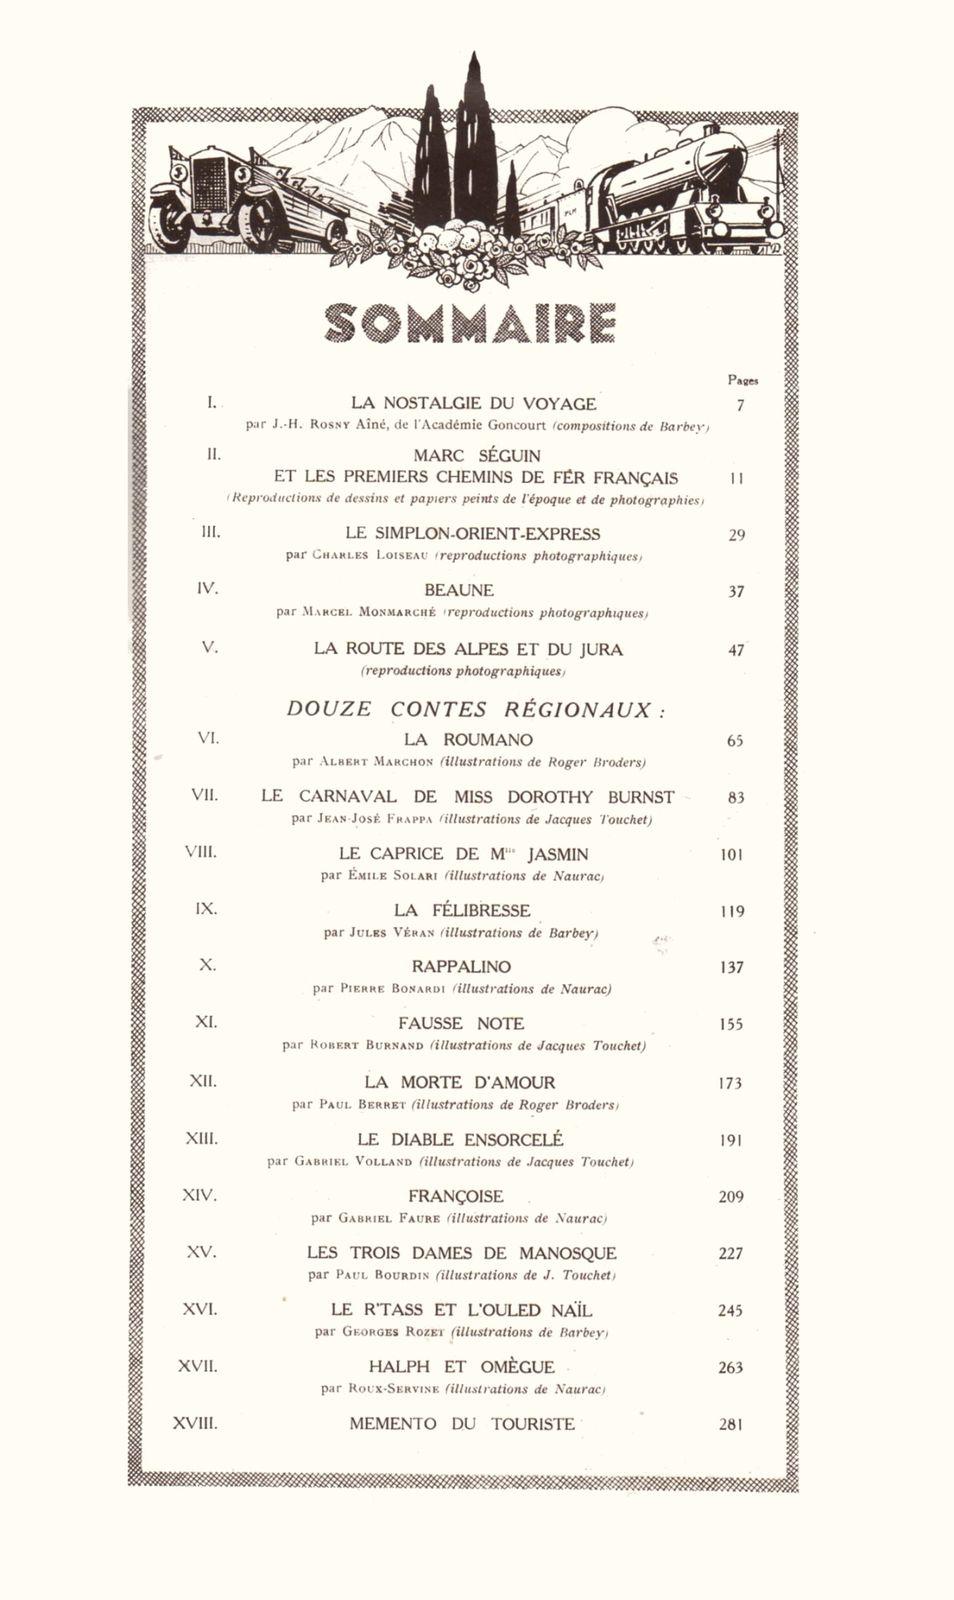 "J.-H. Rosny aîné ""La Nostalgie du Voyage"" in Agenda P.L.M. 1928 (1927)"